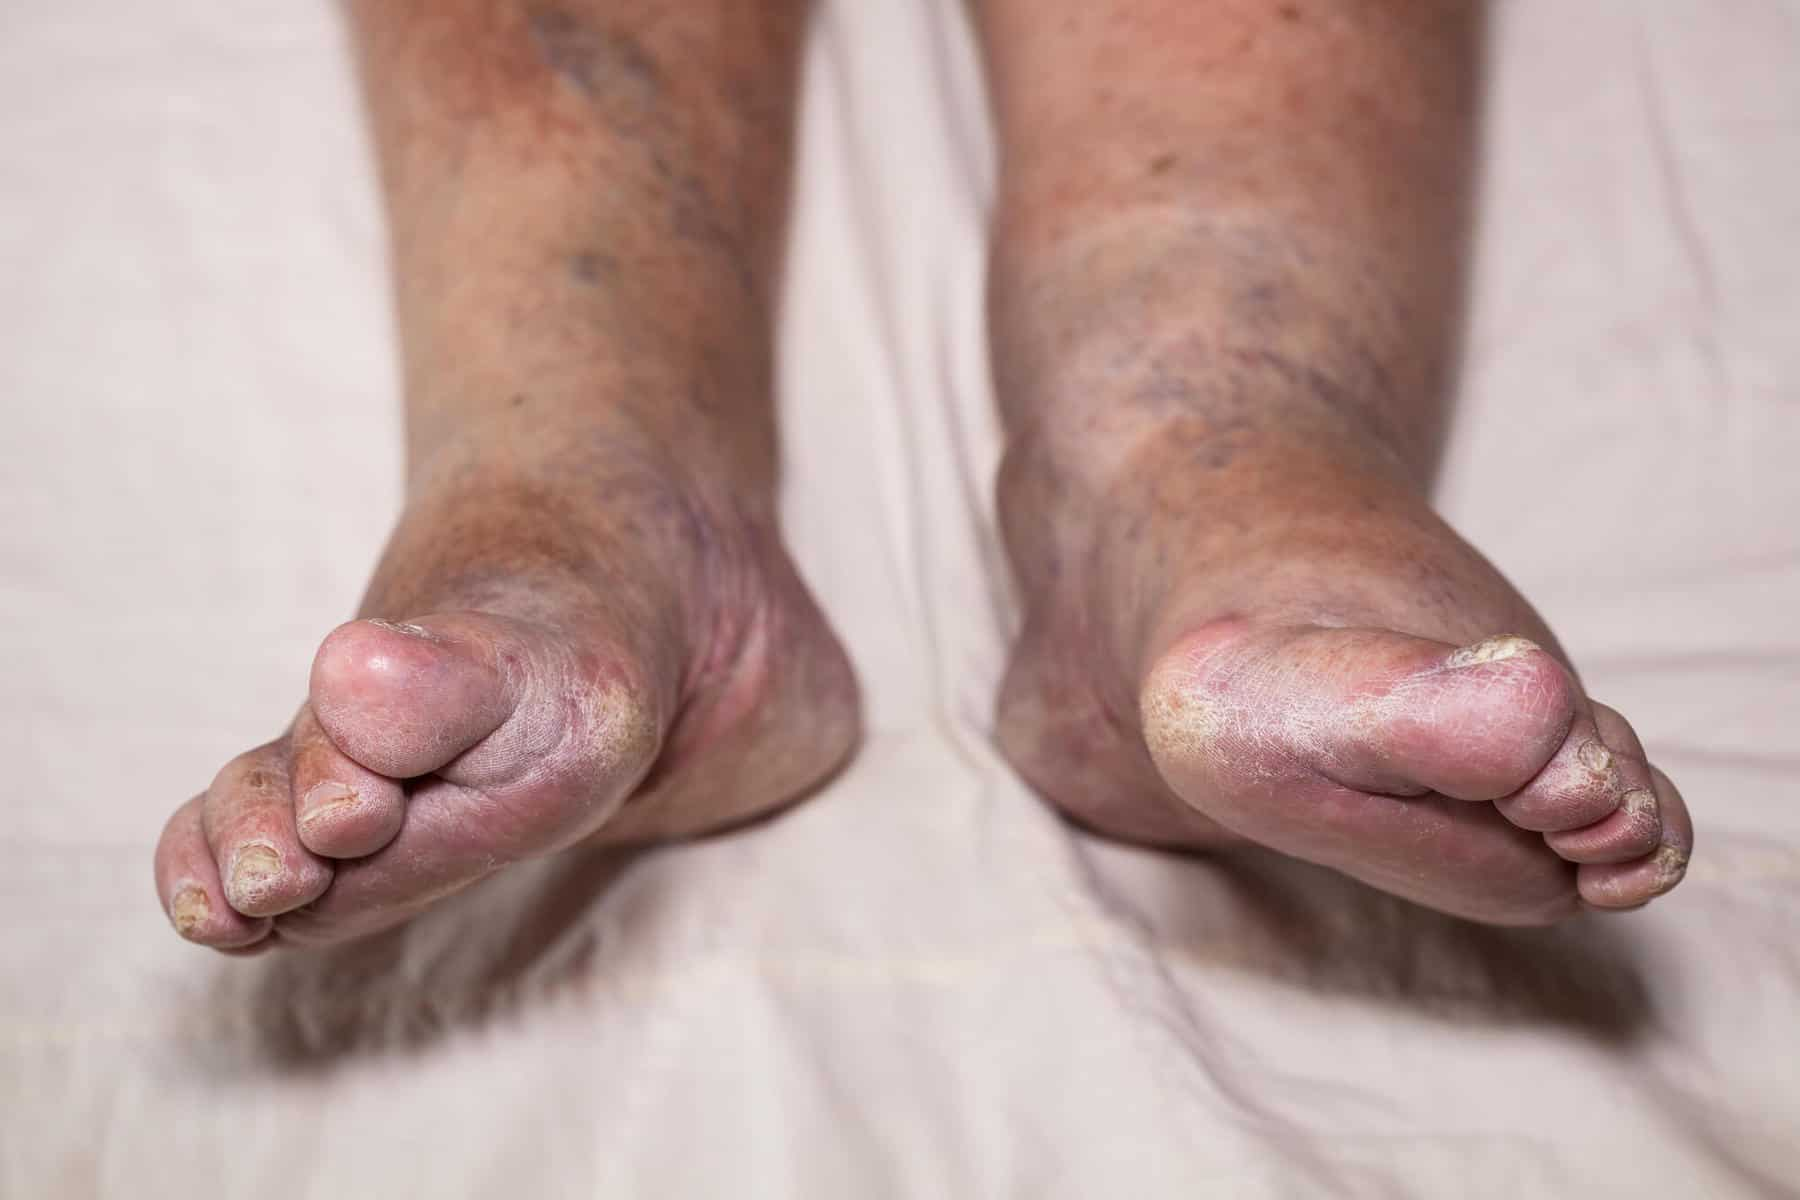 Swollen leg/ankle, Edema